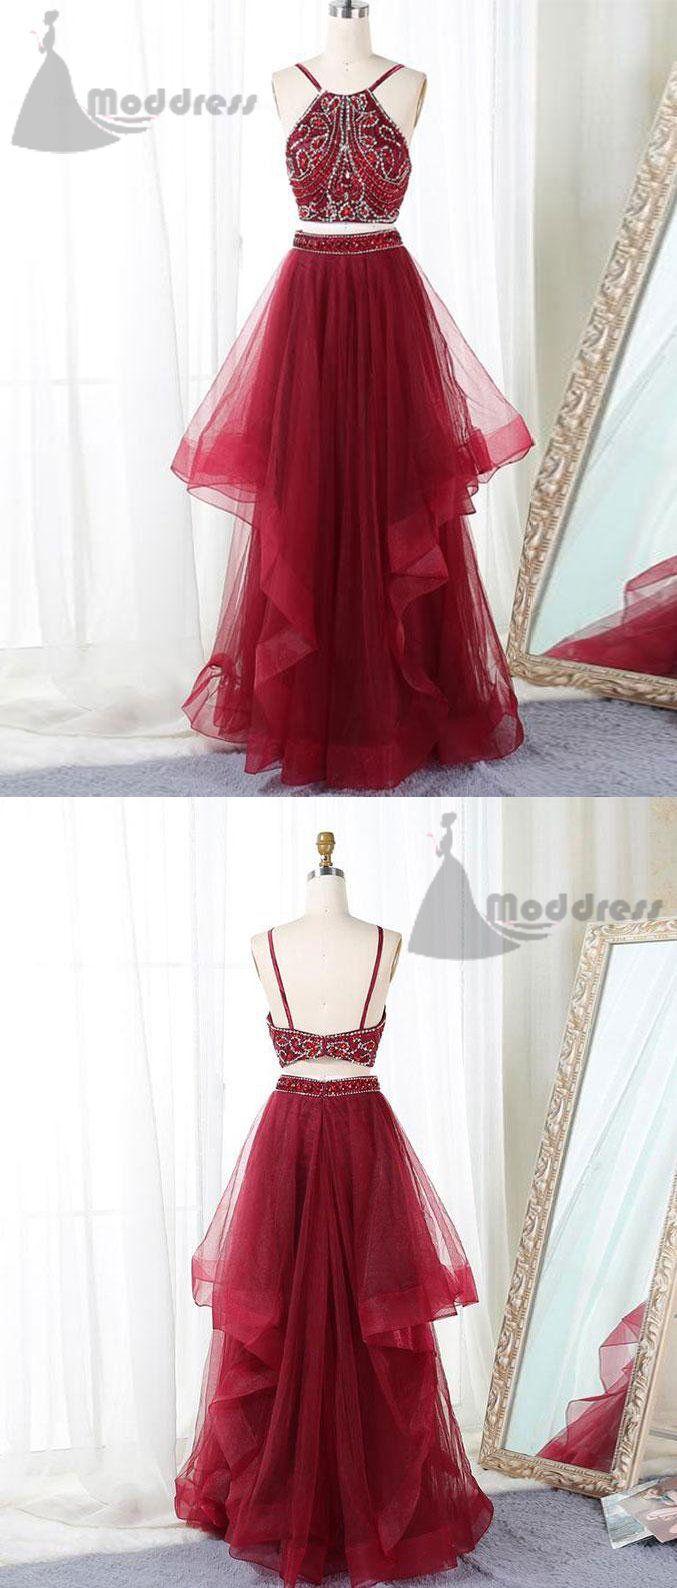 pieces homecoming dress sleeveless long prom dress aline